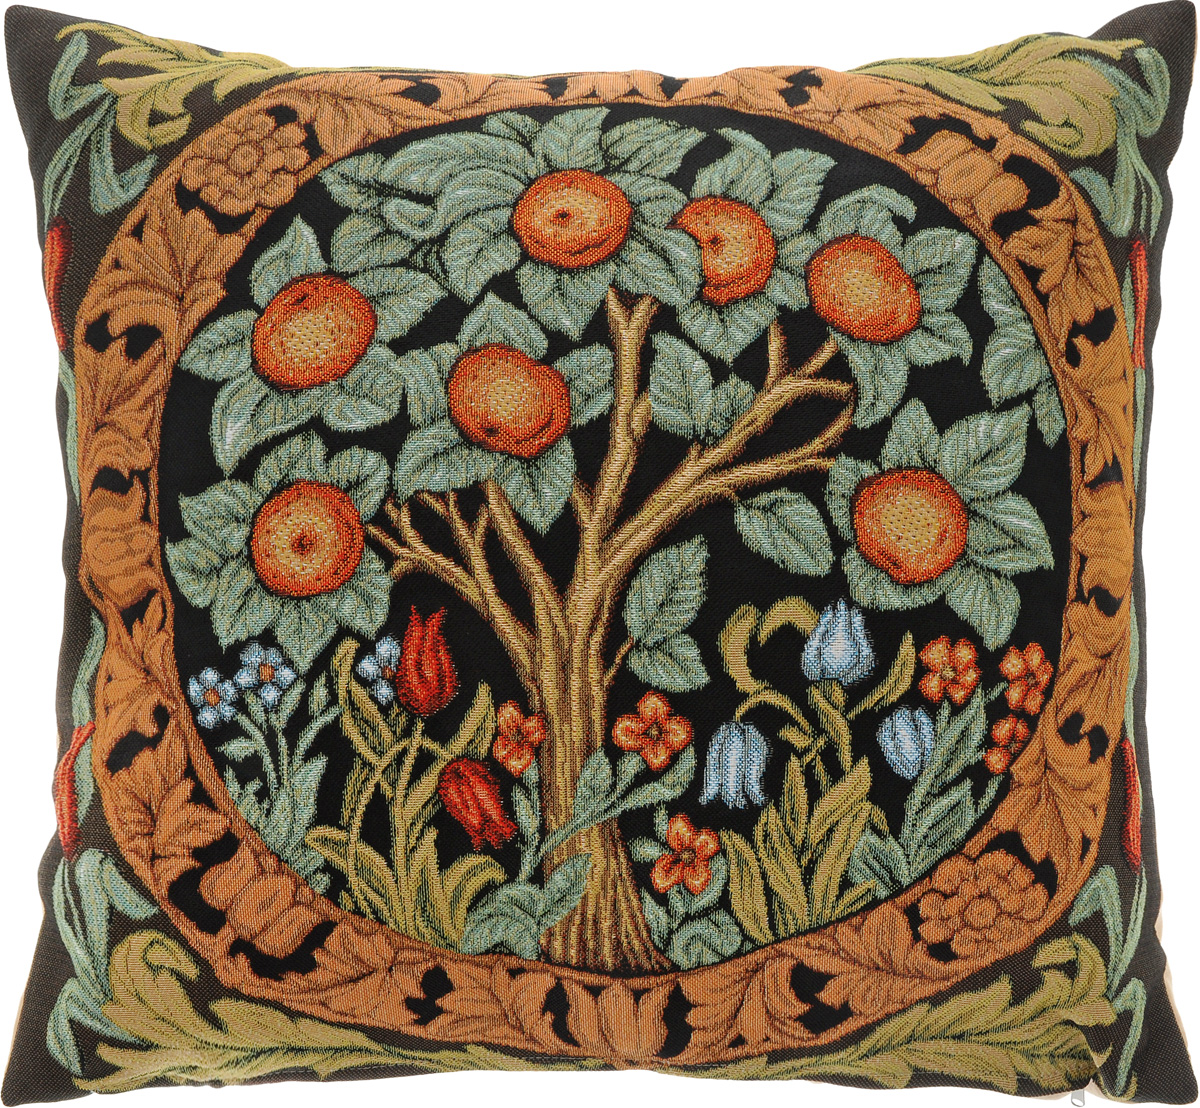 Подушка декоративная Рапира Апельсиновое дерево, 45 х 45 см